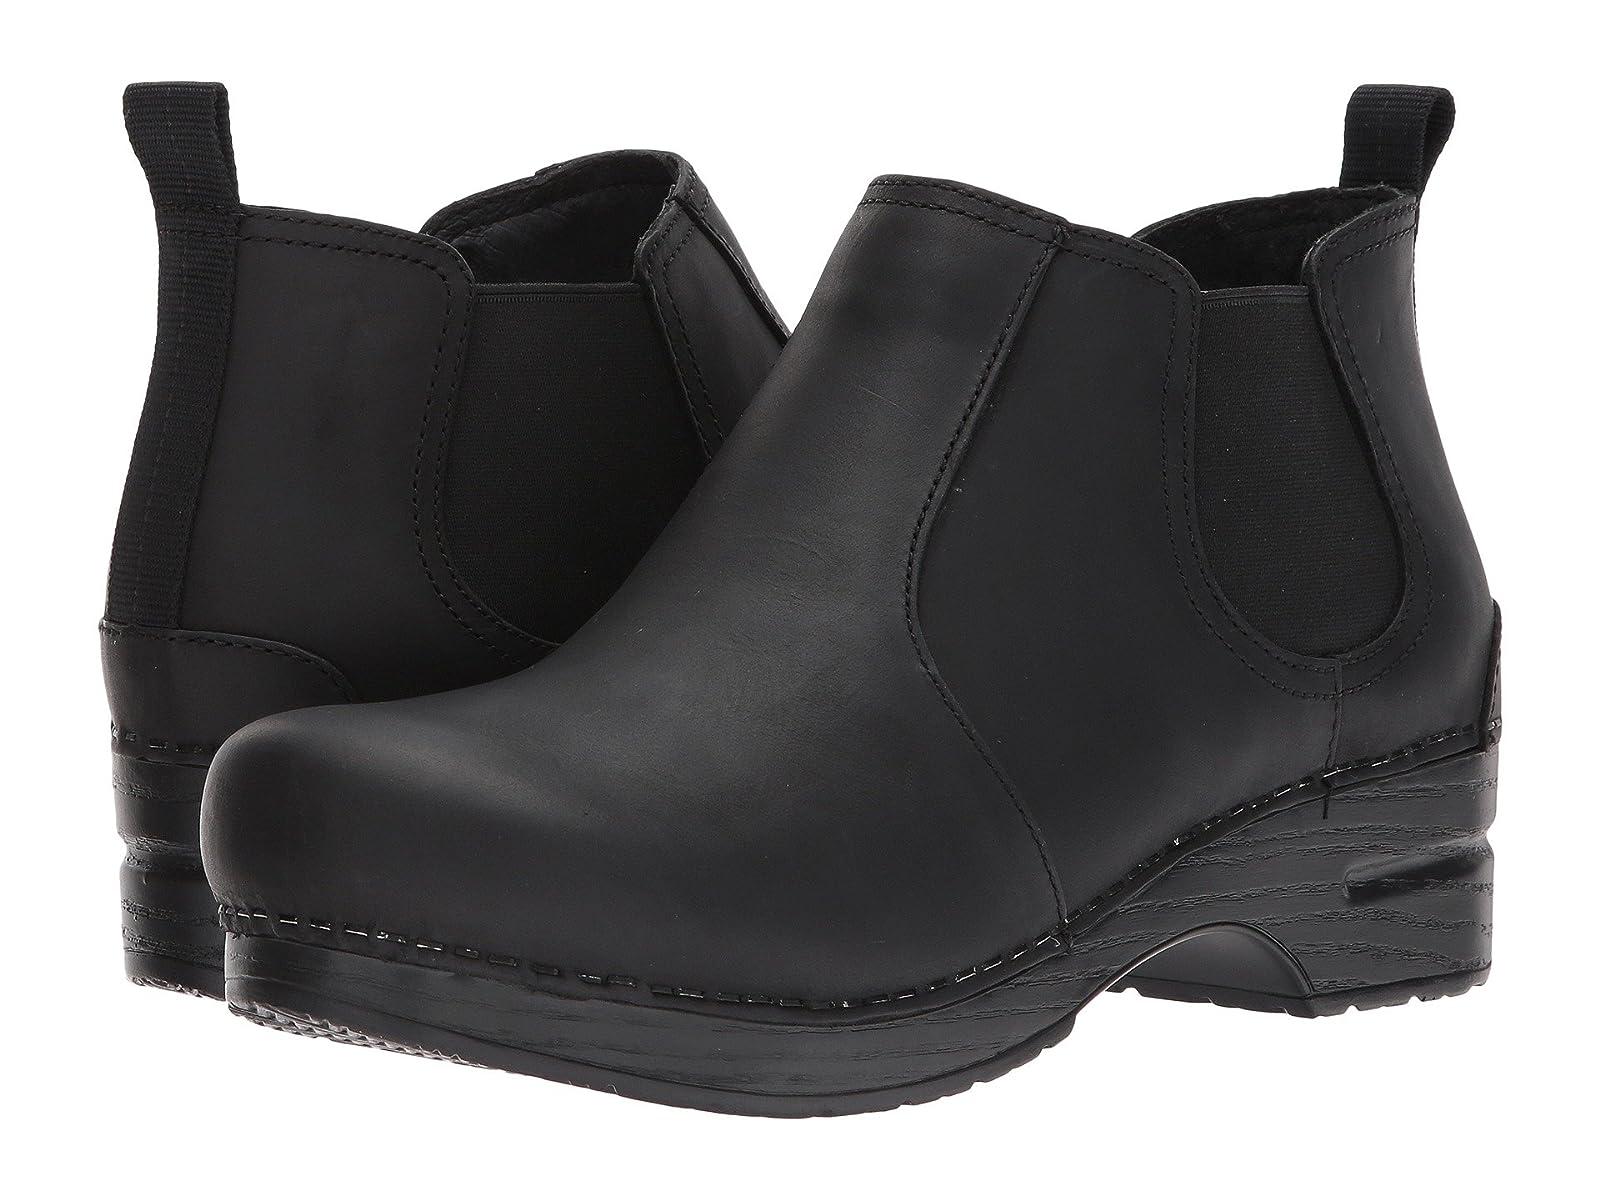 Dansko FrankieAffordable and distinctive shoes